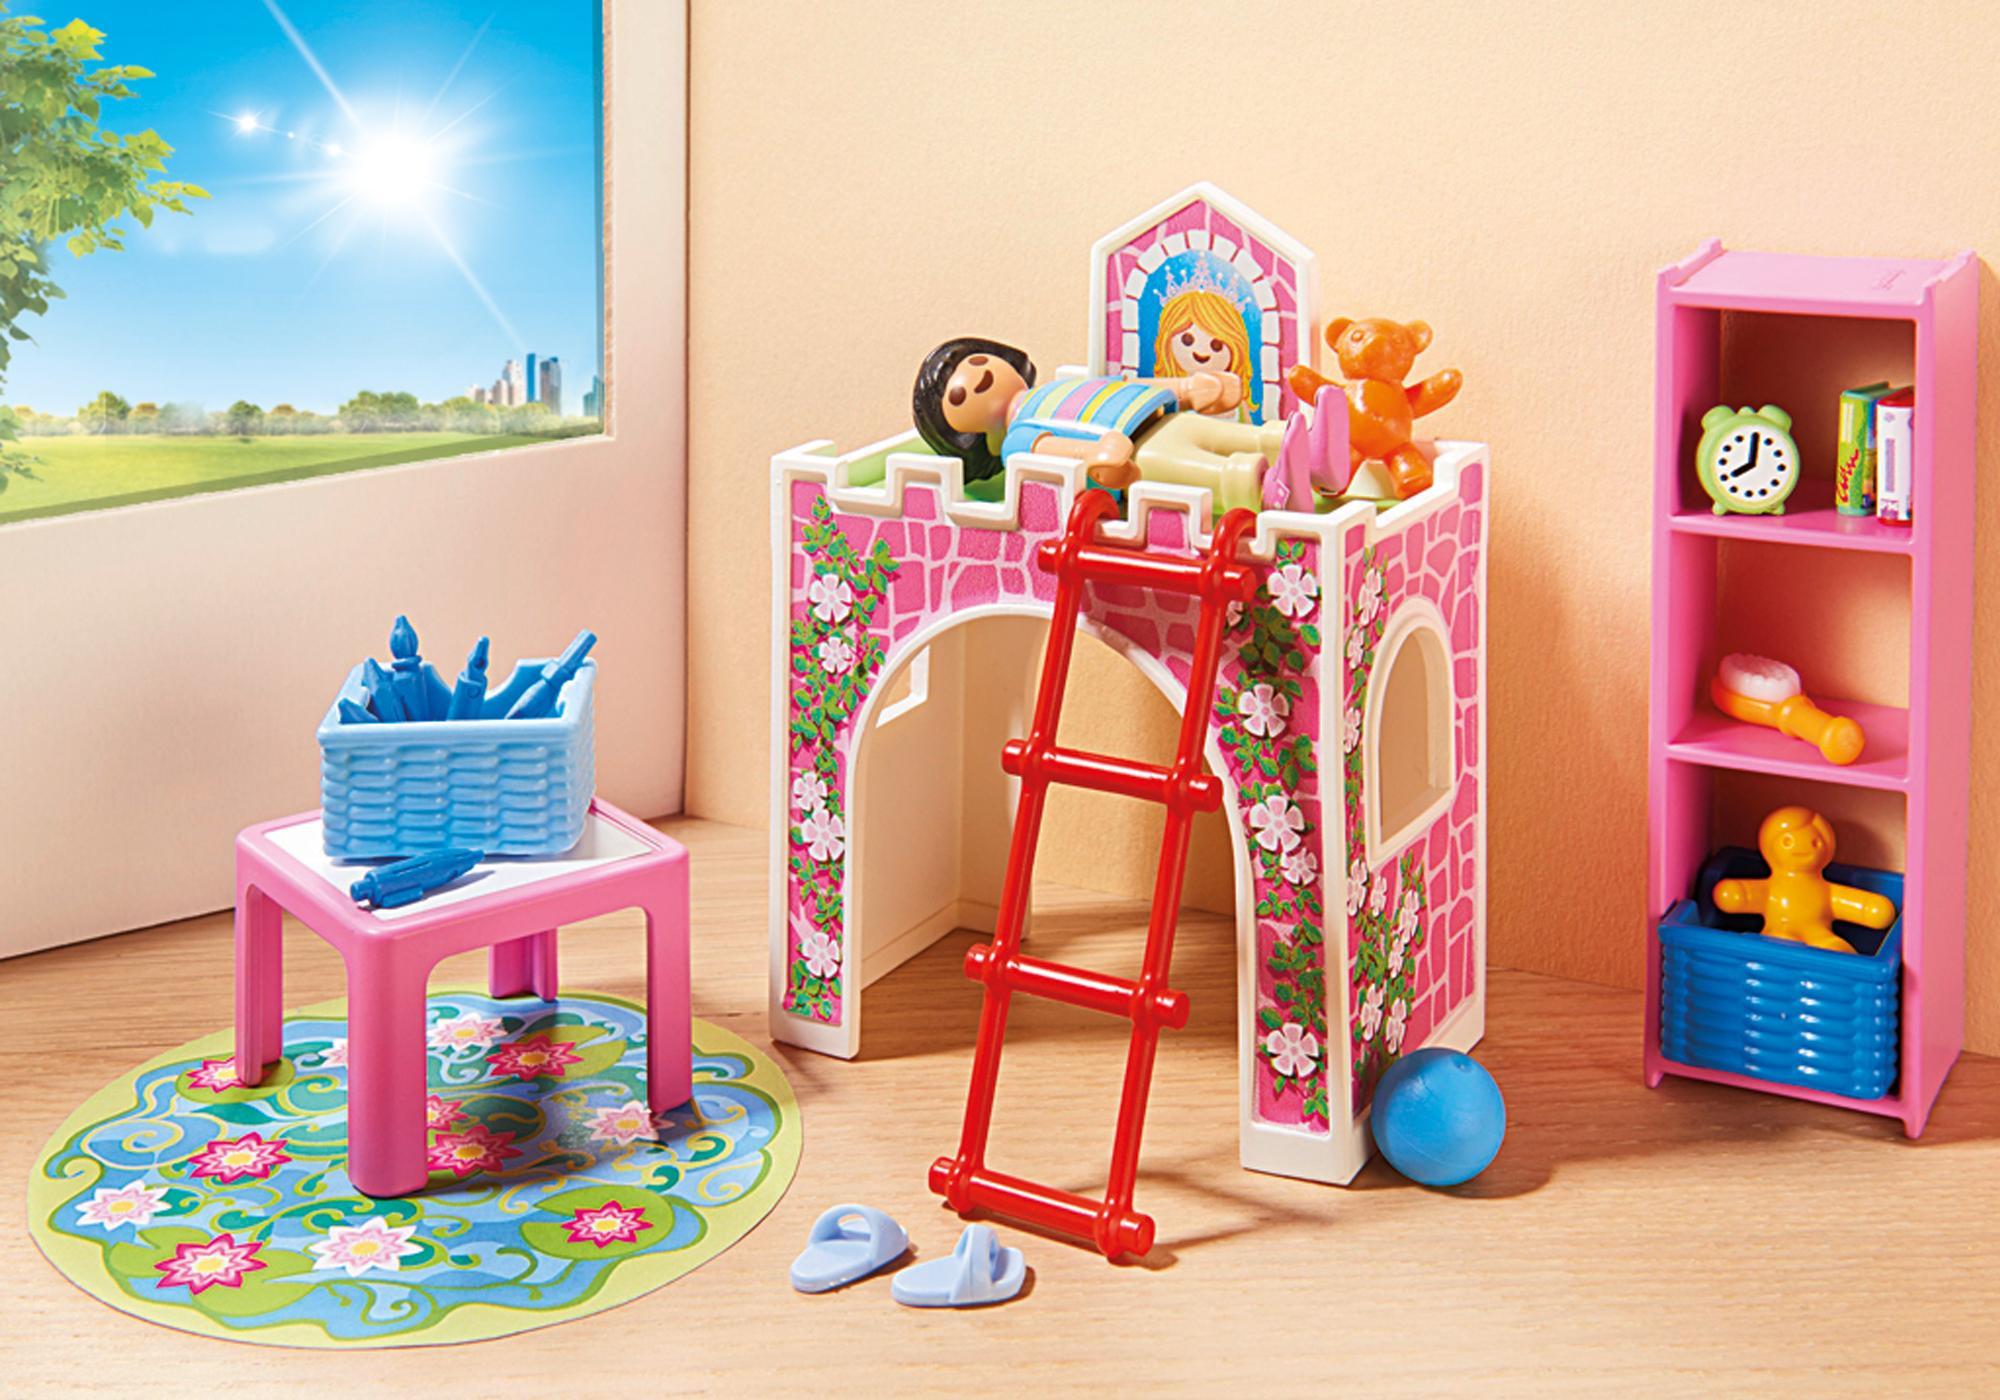 http://media.playmobil.com/i/playmobil/9270_product_extra1